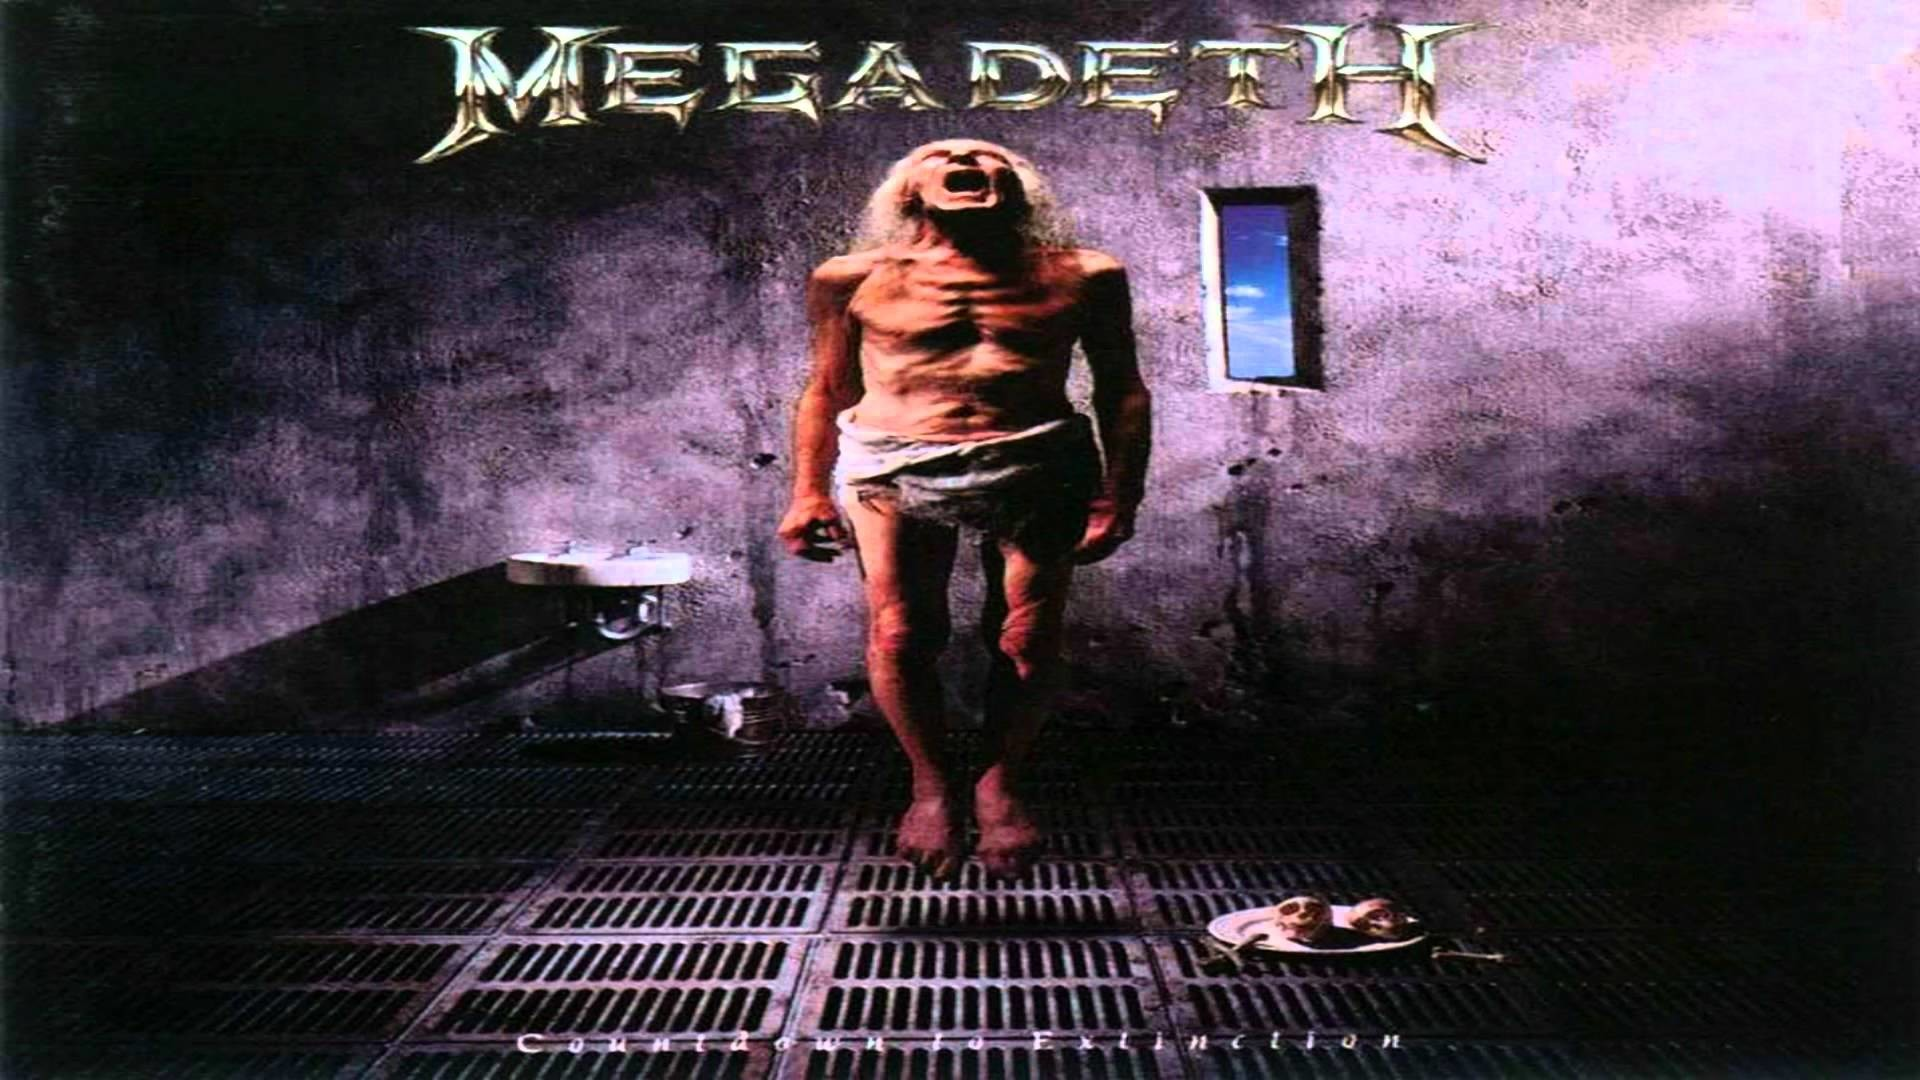 Megadeth – Sweating Bullets [Guitar Backing Track]